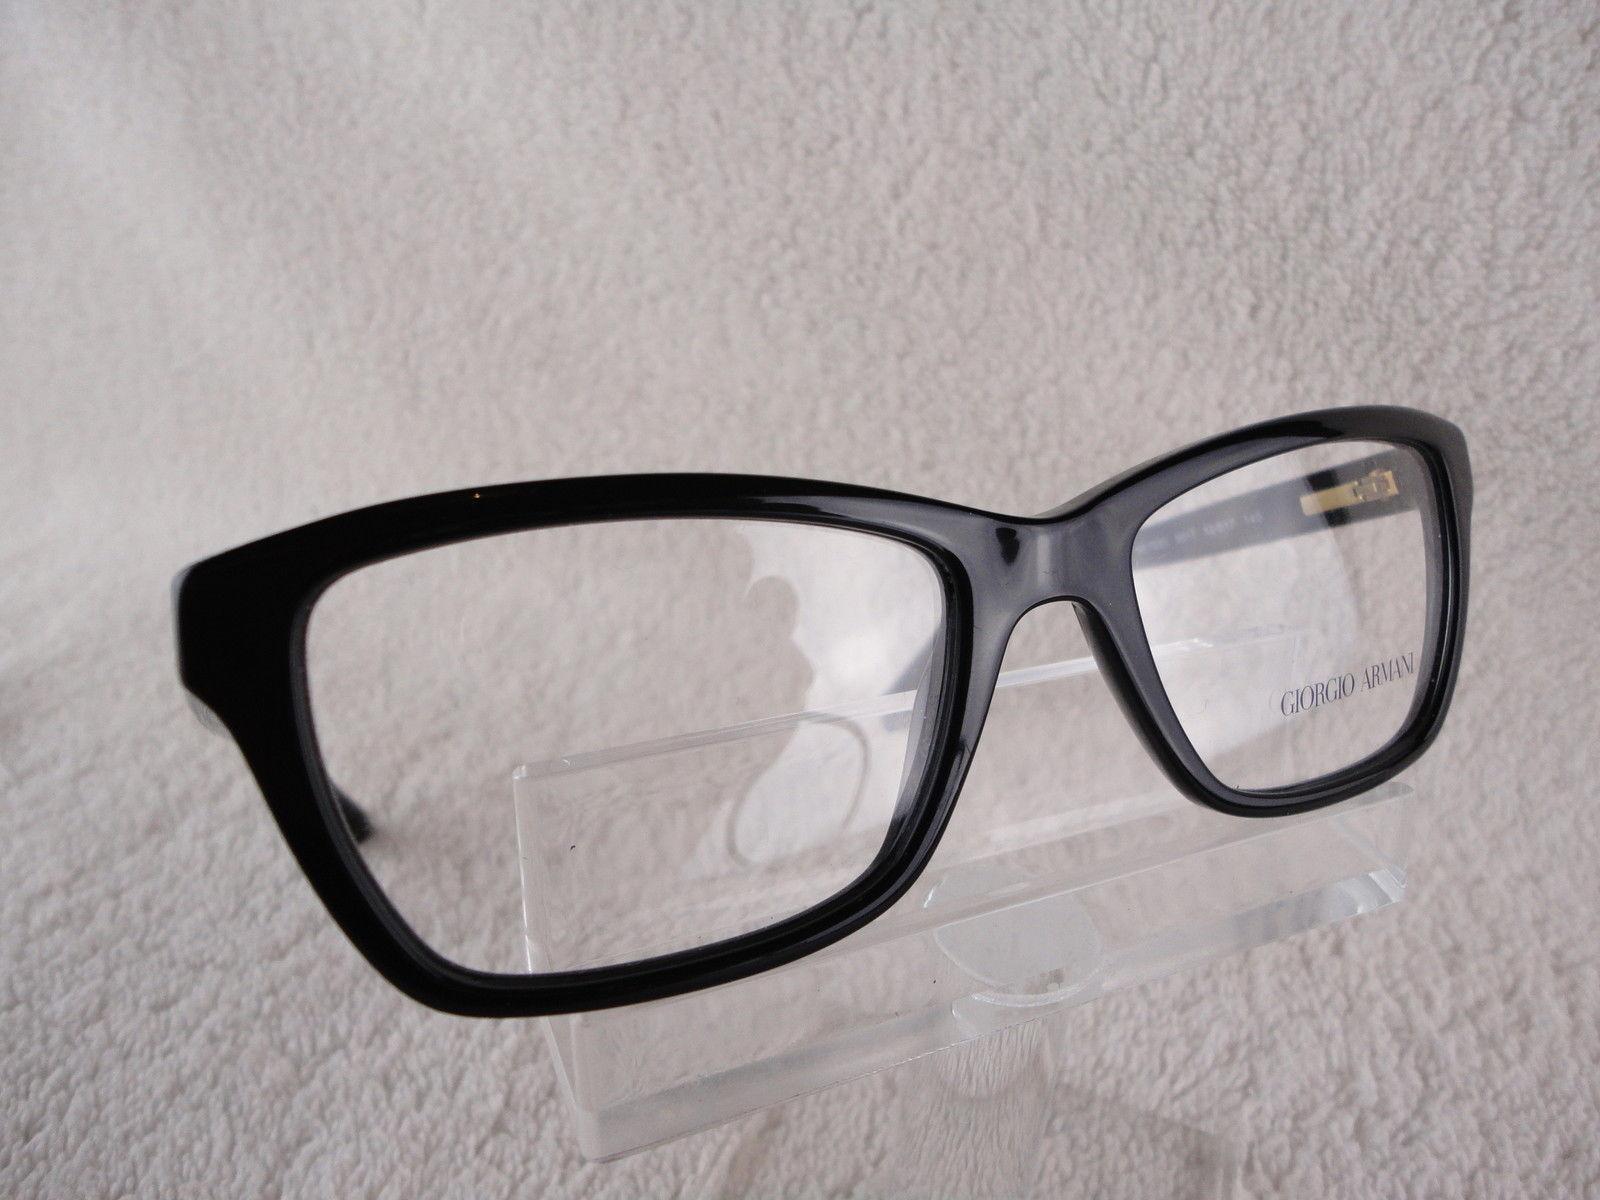 Giorgio Armani AR 7012 (5030) Olive 52 X 17 140mm Eyeglass Frame - $43.96